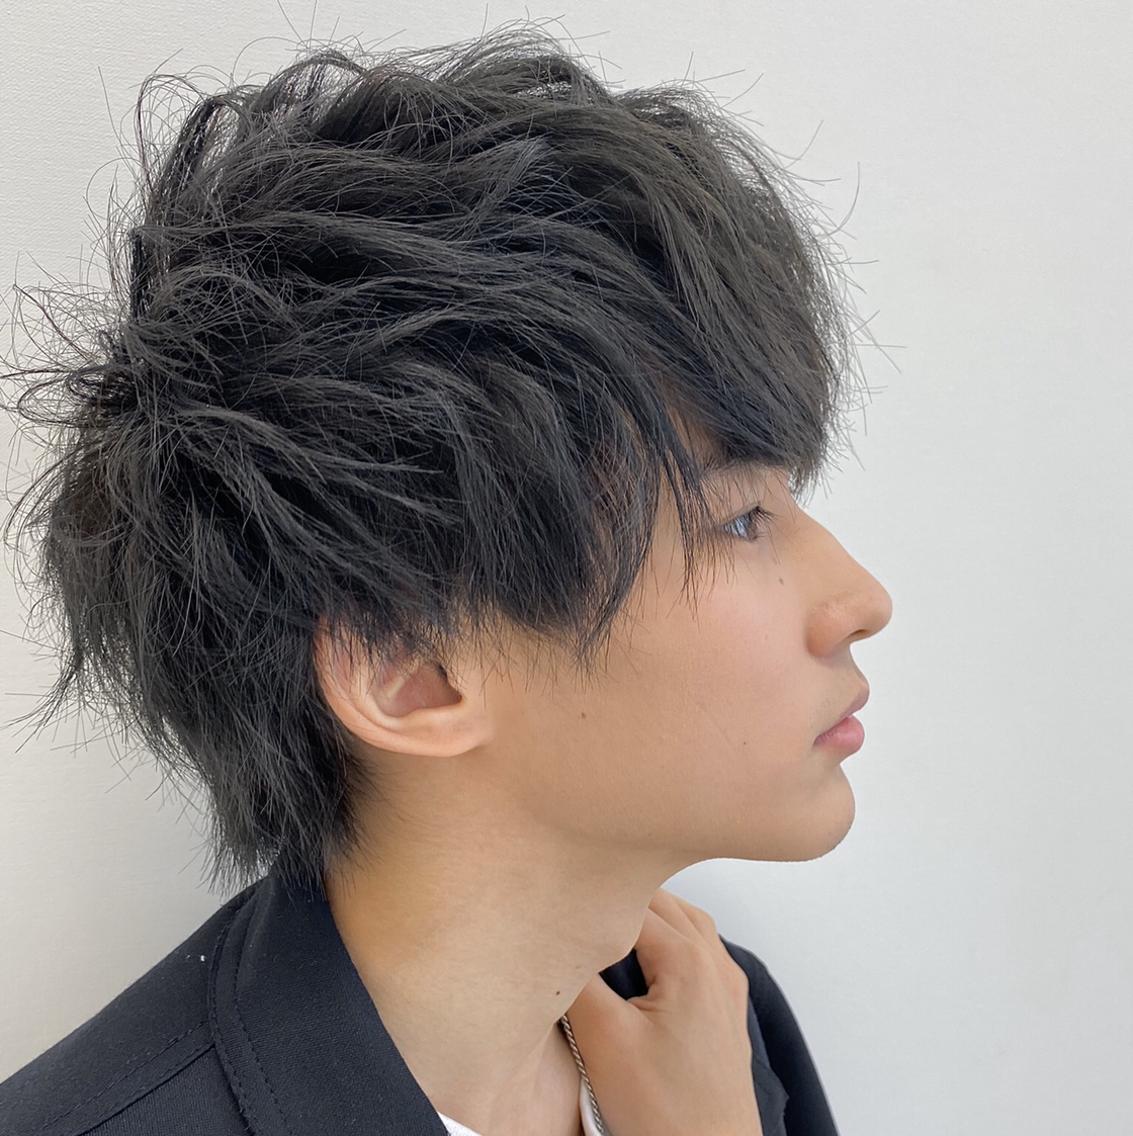 KENJE平塚LUSCA所属・🌈メンズ歓迎 🌈渡邉祐太の掲載